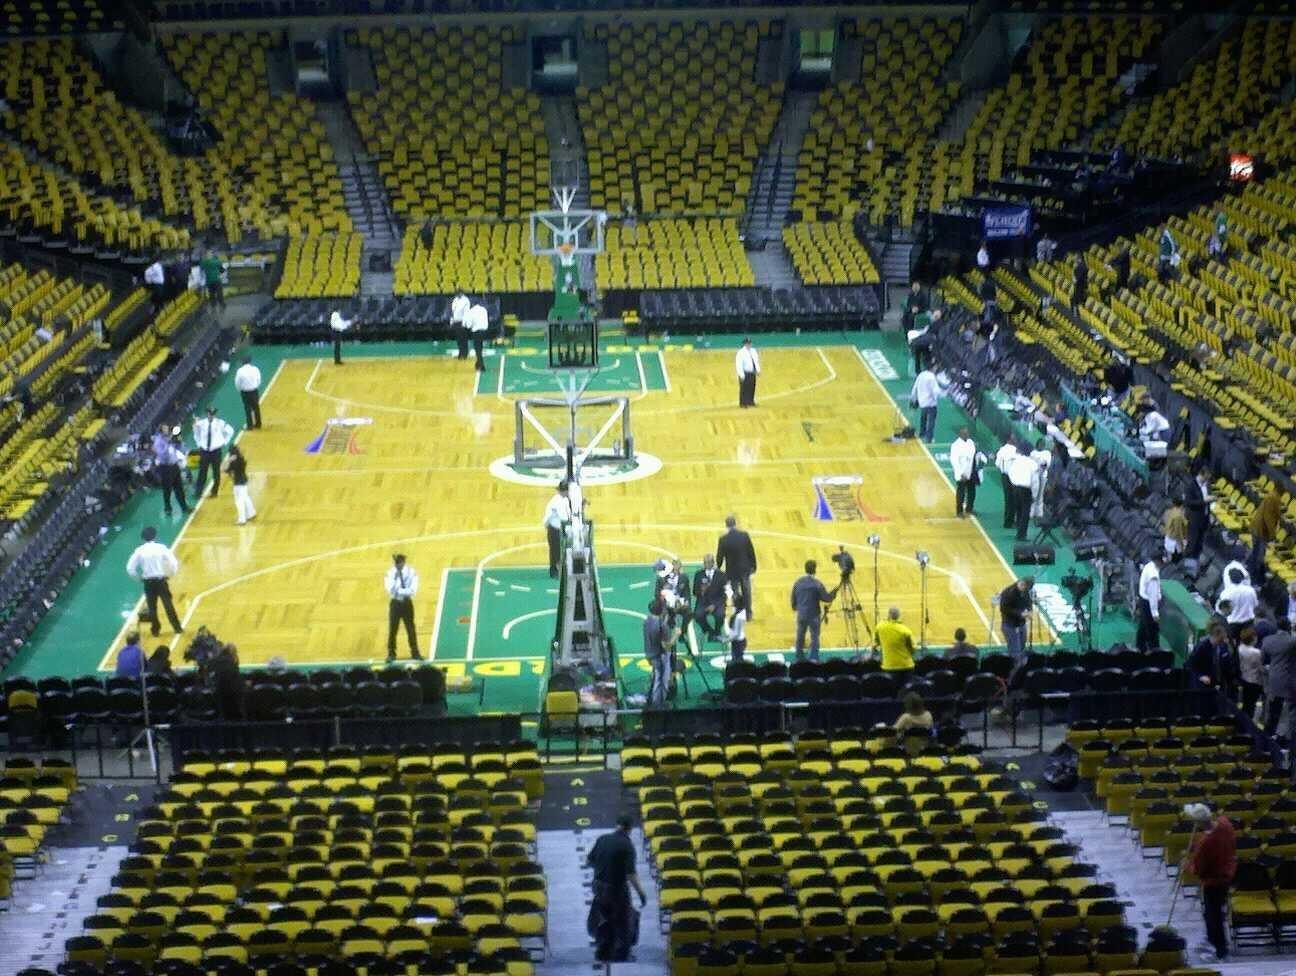 Td Garden Section Bal 323 Boston Celtics Shared Anonymously